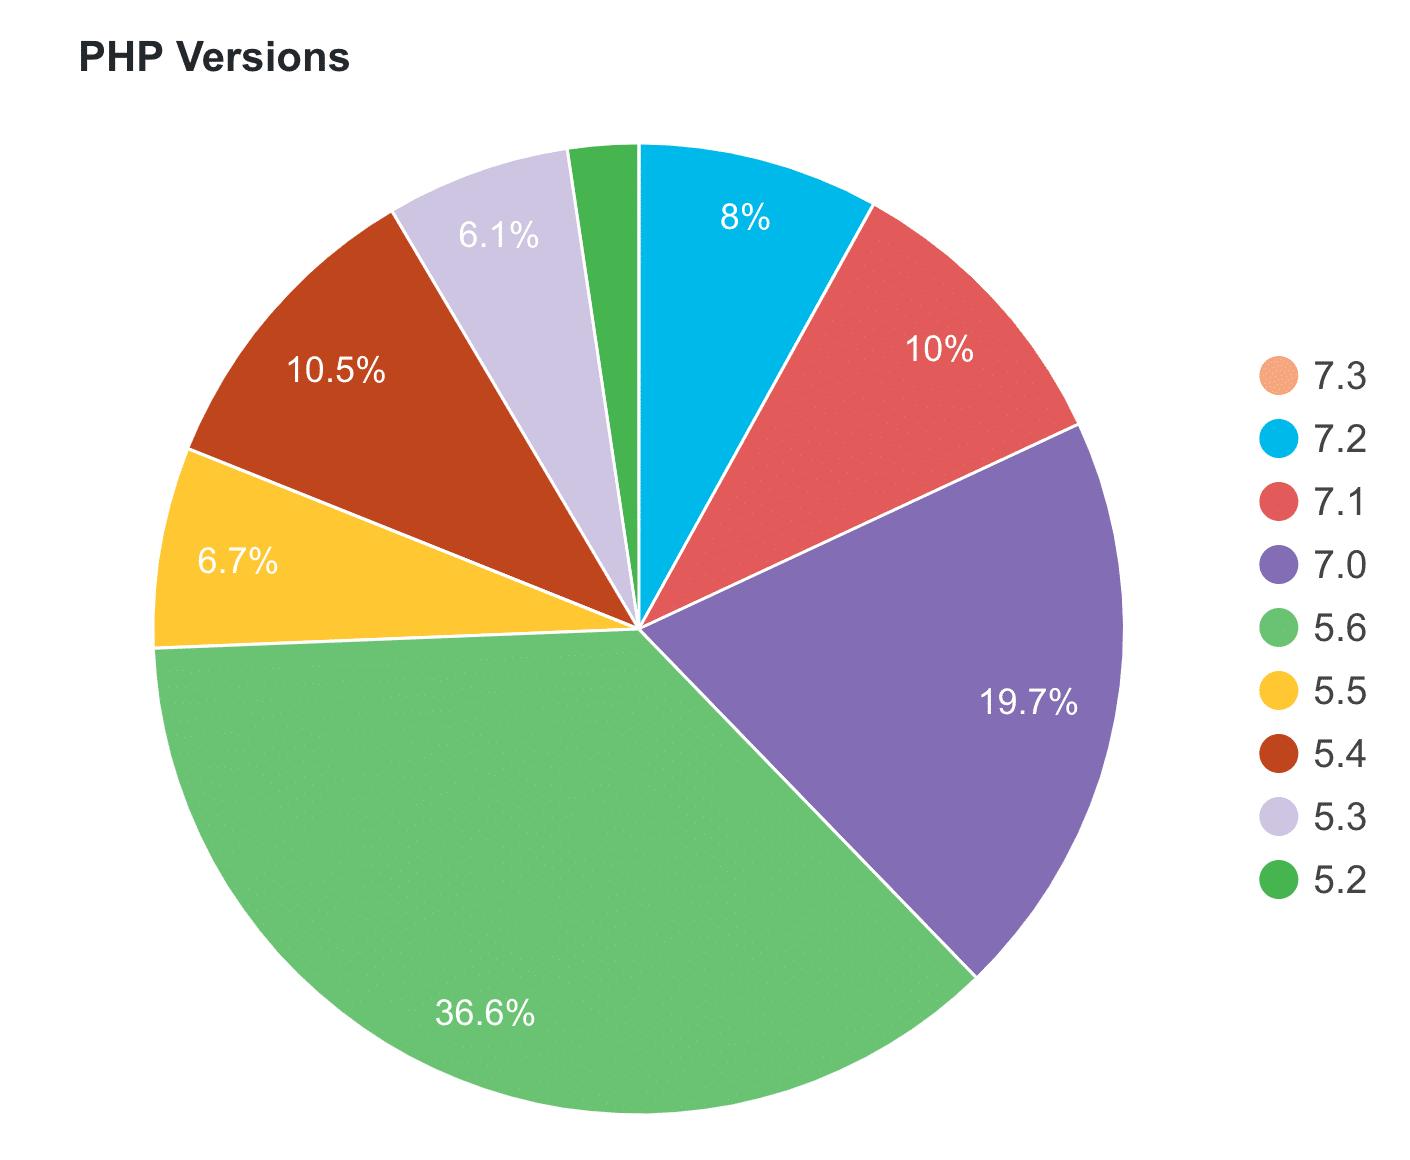 PHP version usage for WordPress sites